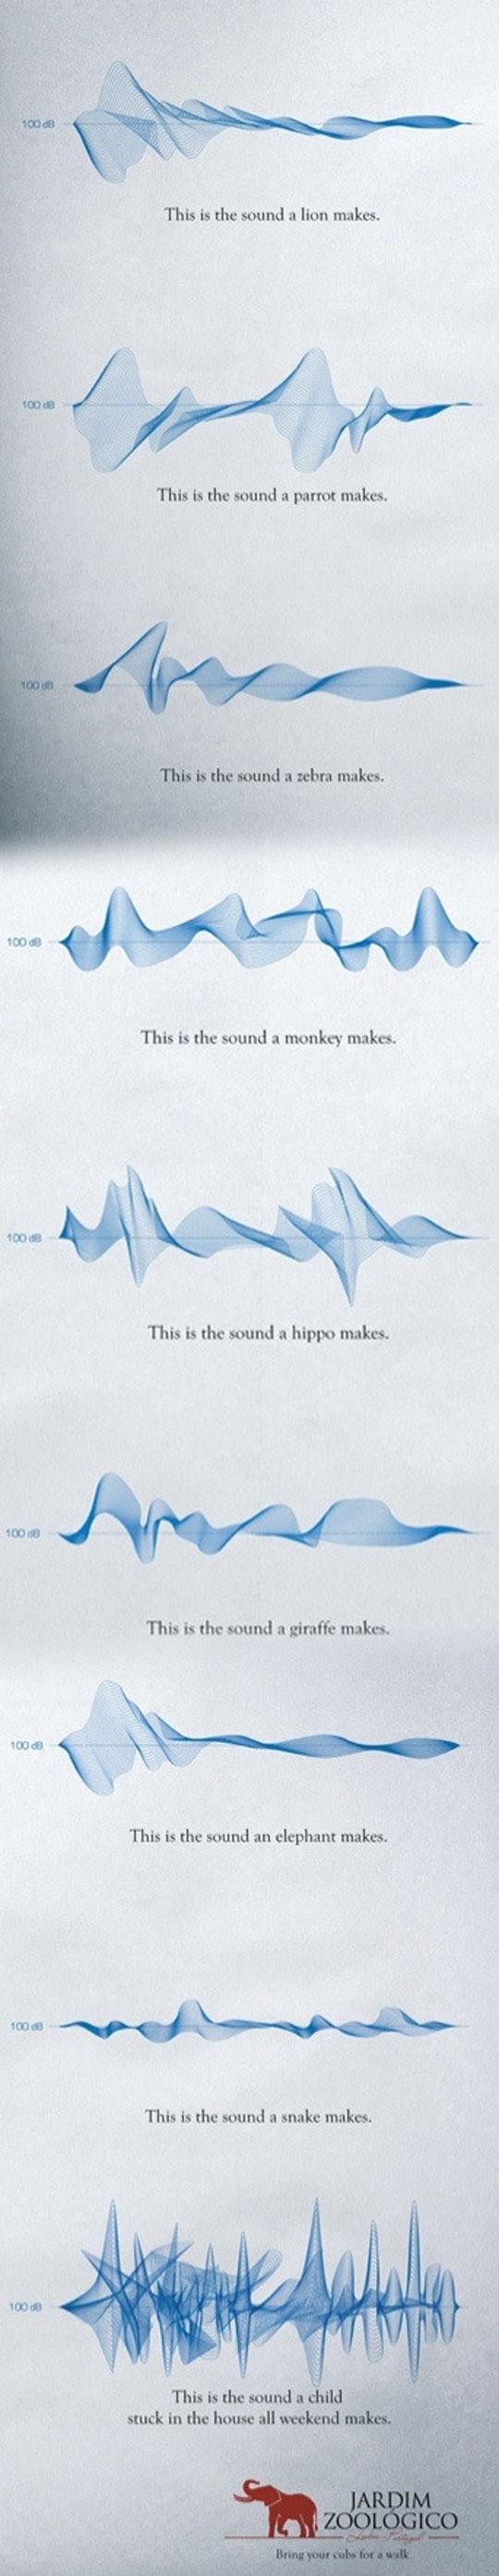 cool-zoo-ad-animal-sound-waves